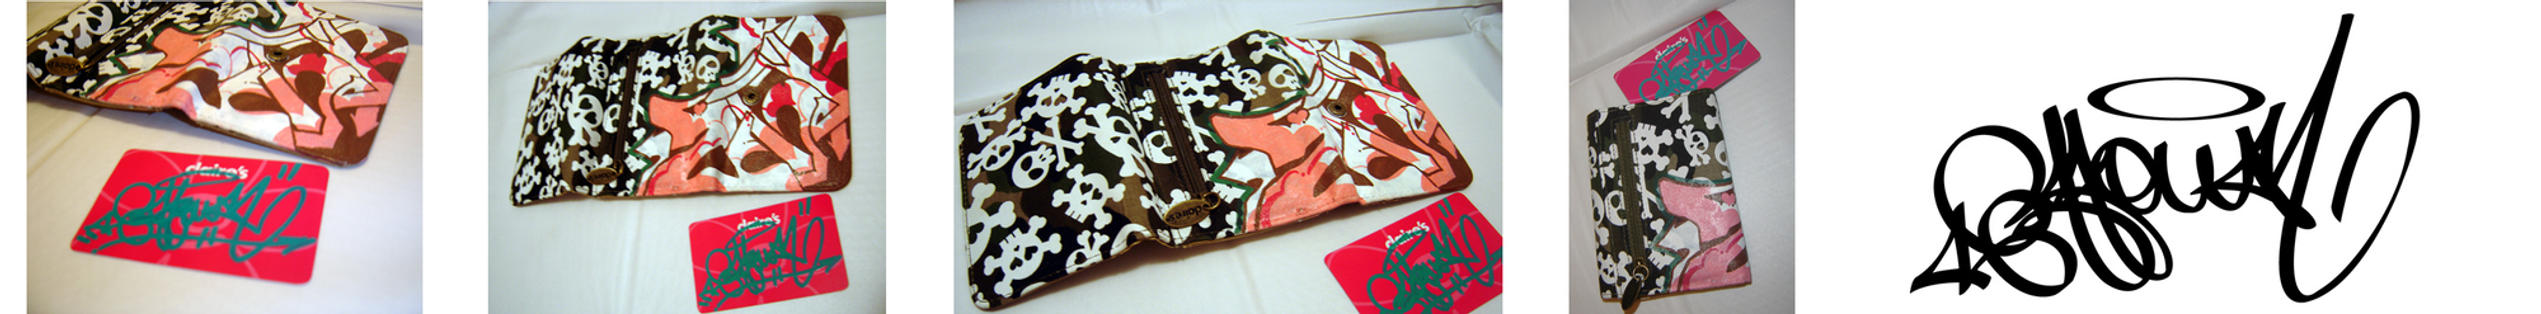 My Zori4 Wallet by ZORIFOUR